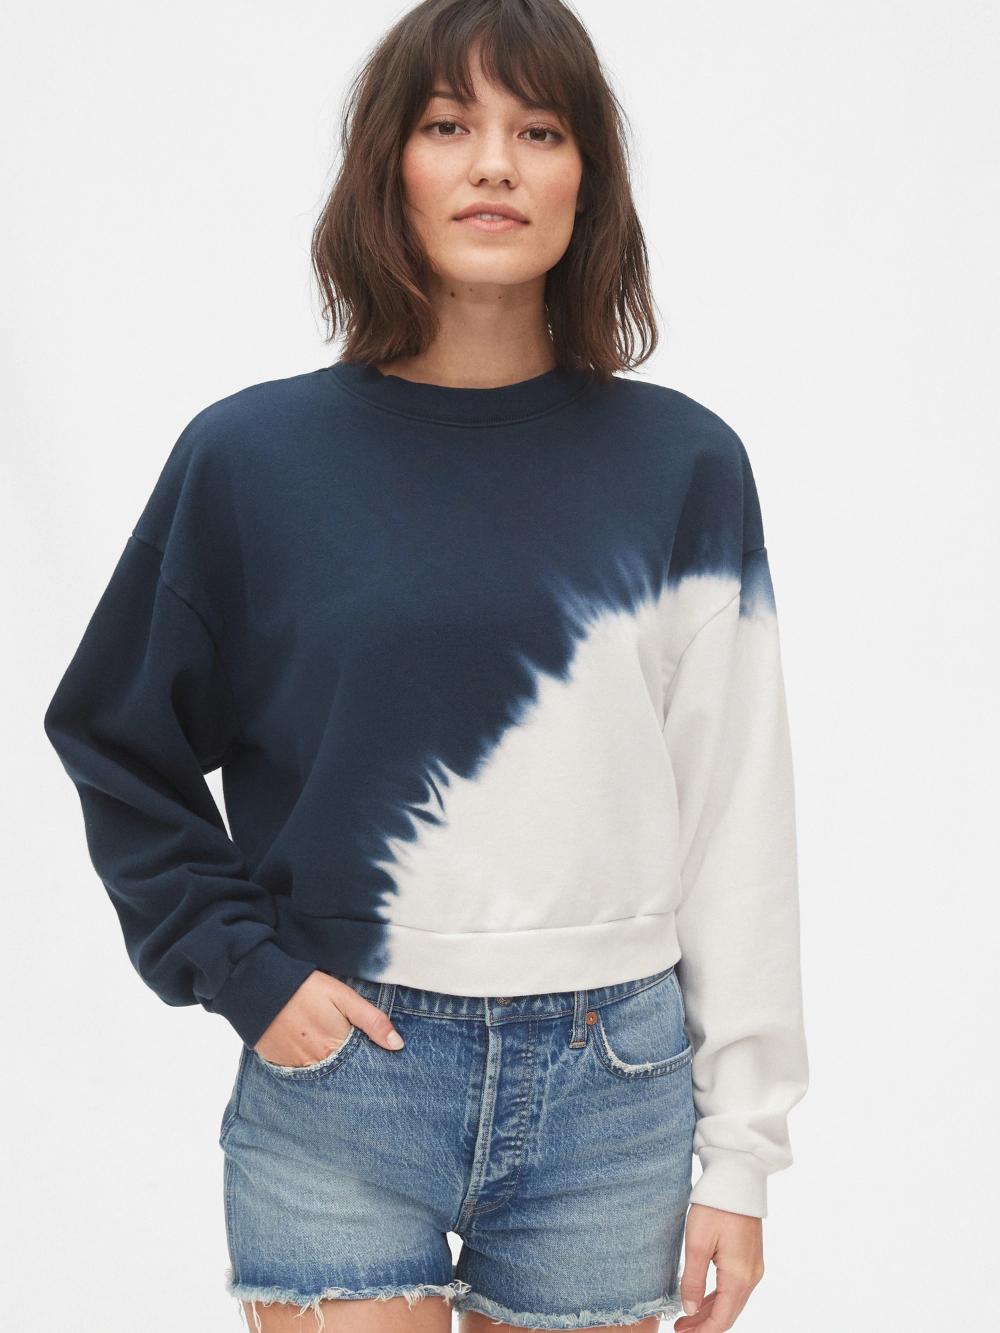 Pullover Sweatshirt In French Terry Gap Collar Shirt Under Sweatshirt Fashion Tie Dye Print [ 1333 x 1000 Pixel ]